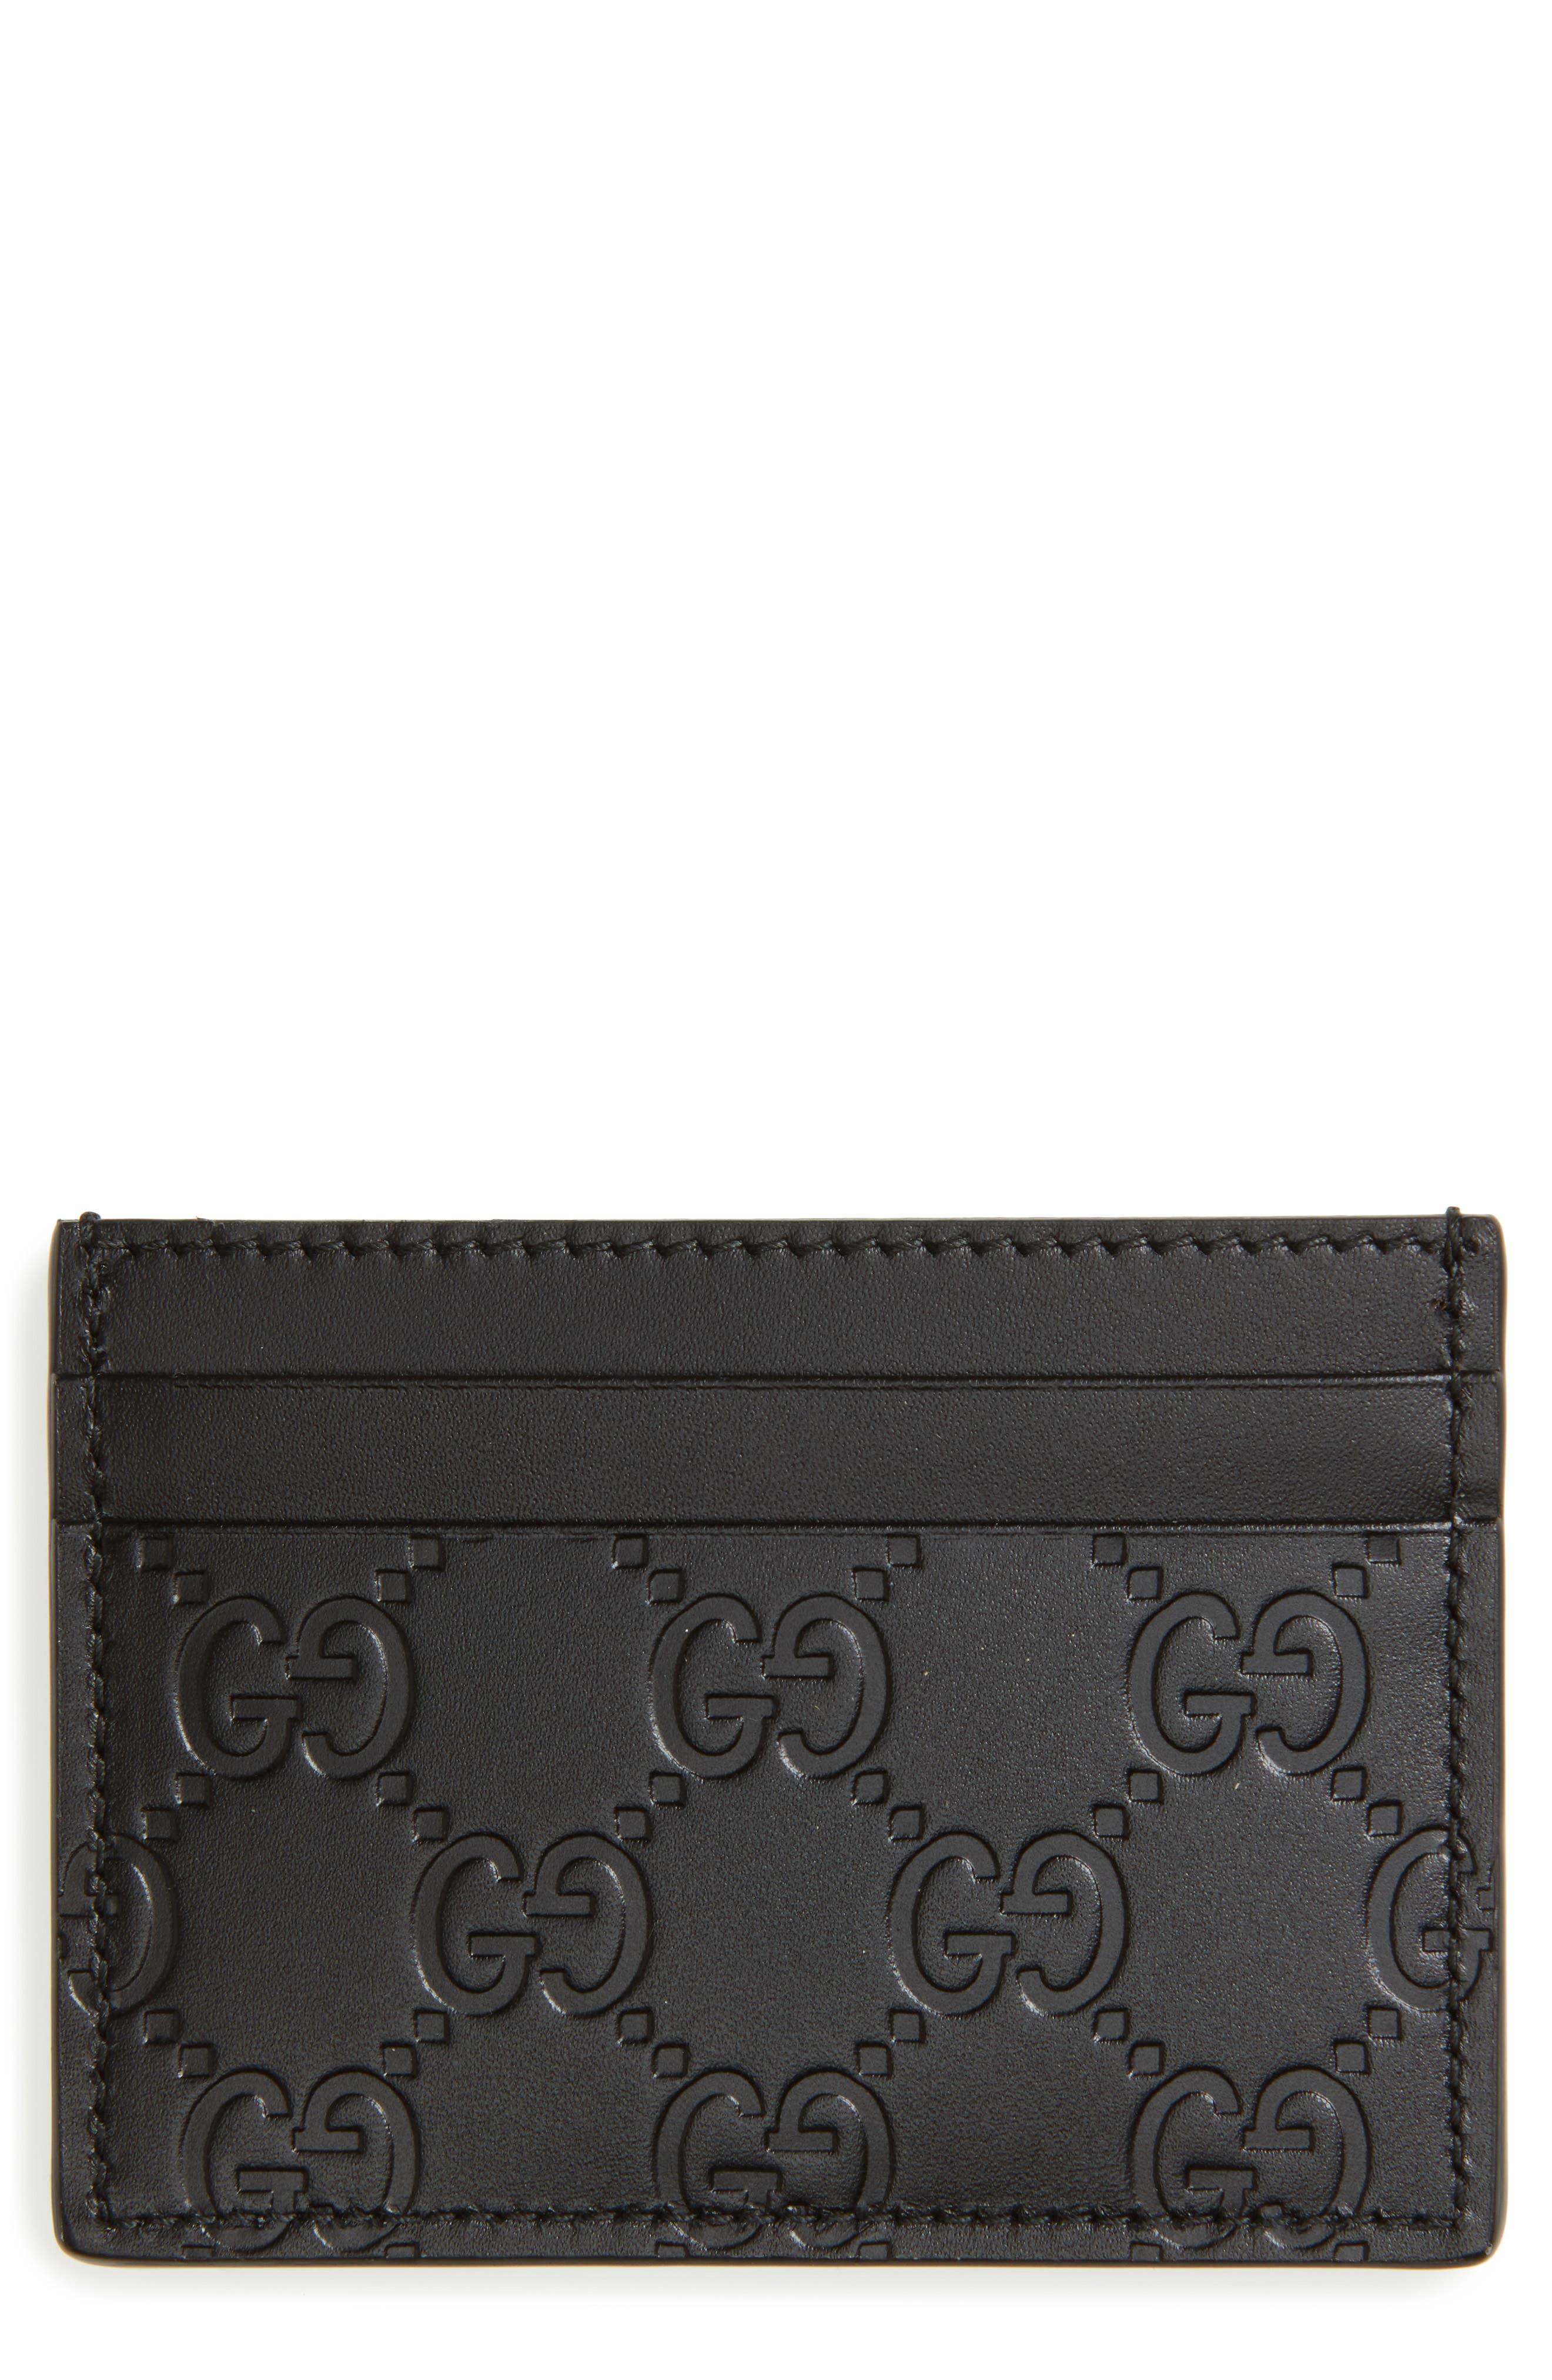 Leather Card Case,                         Main,                         color, 1000 Nero